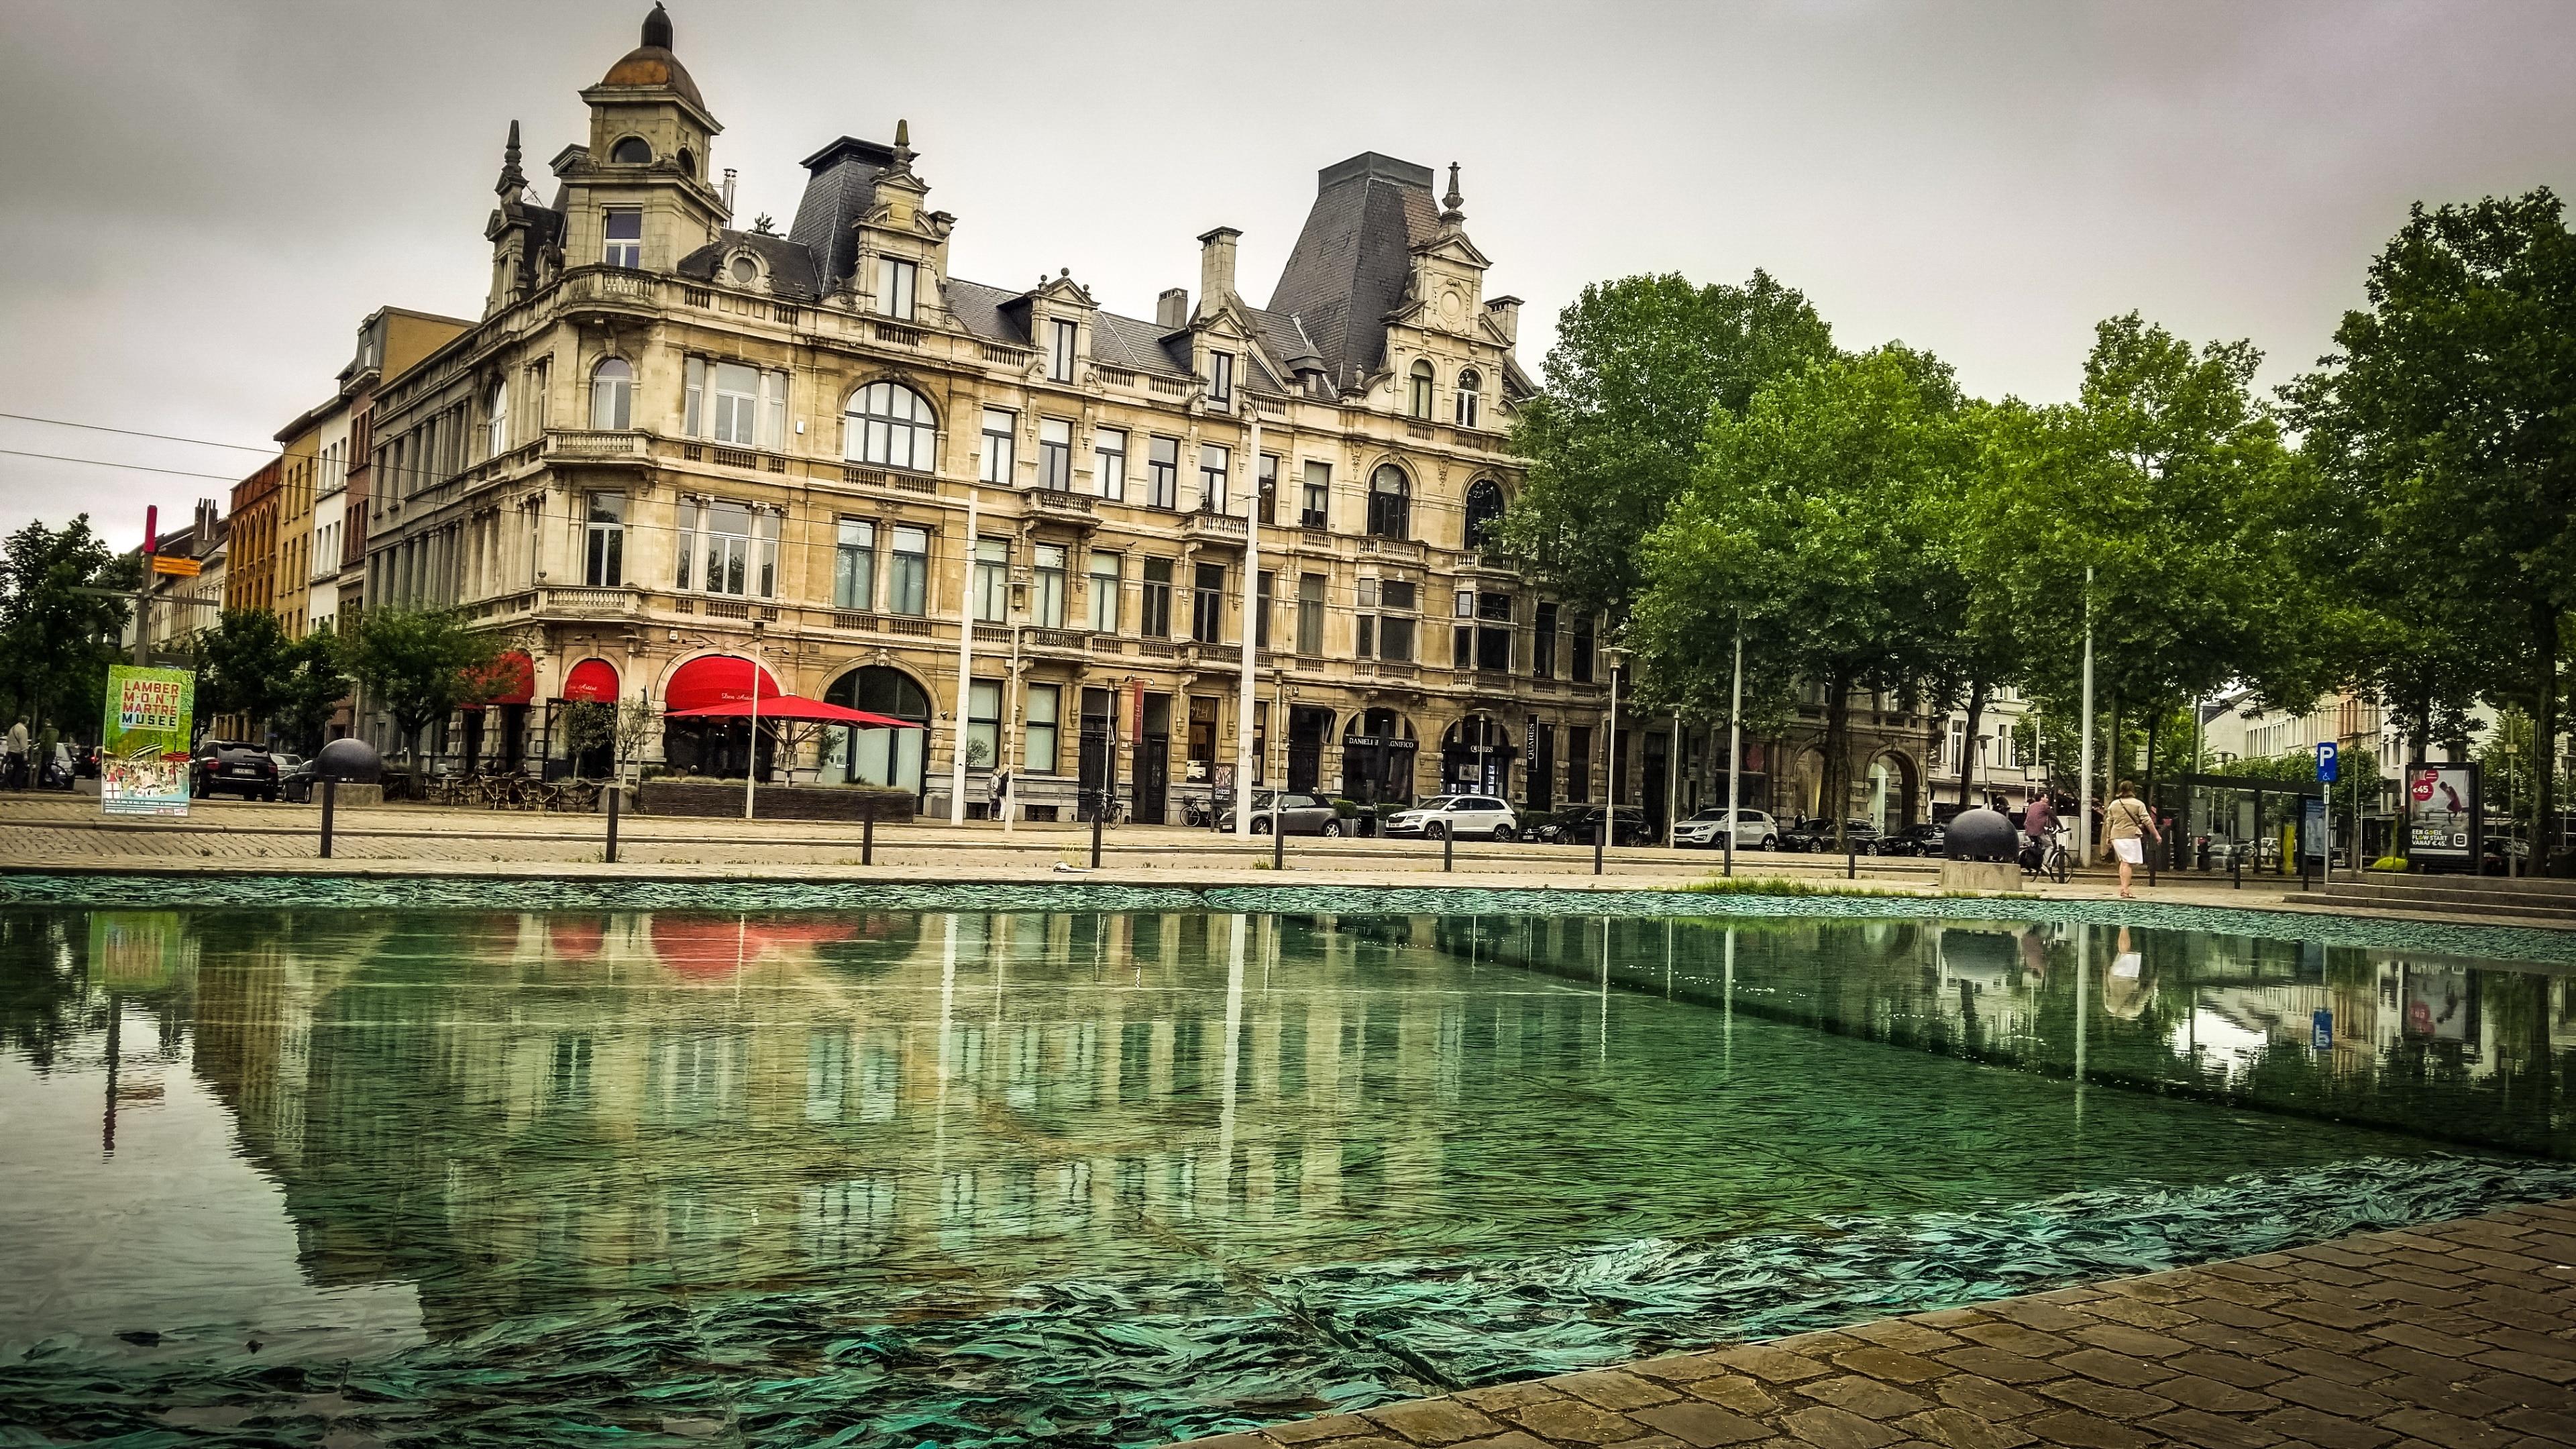 South Antwerp, Antwerp, Flemish Region, Belgium